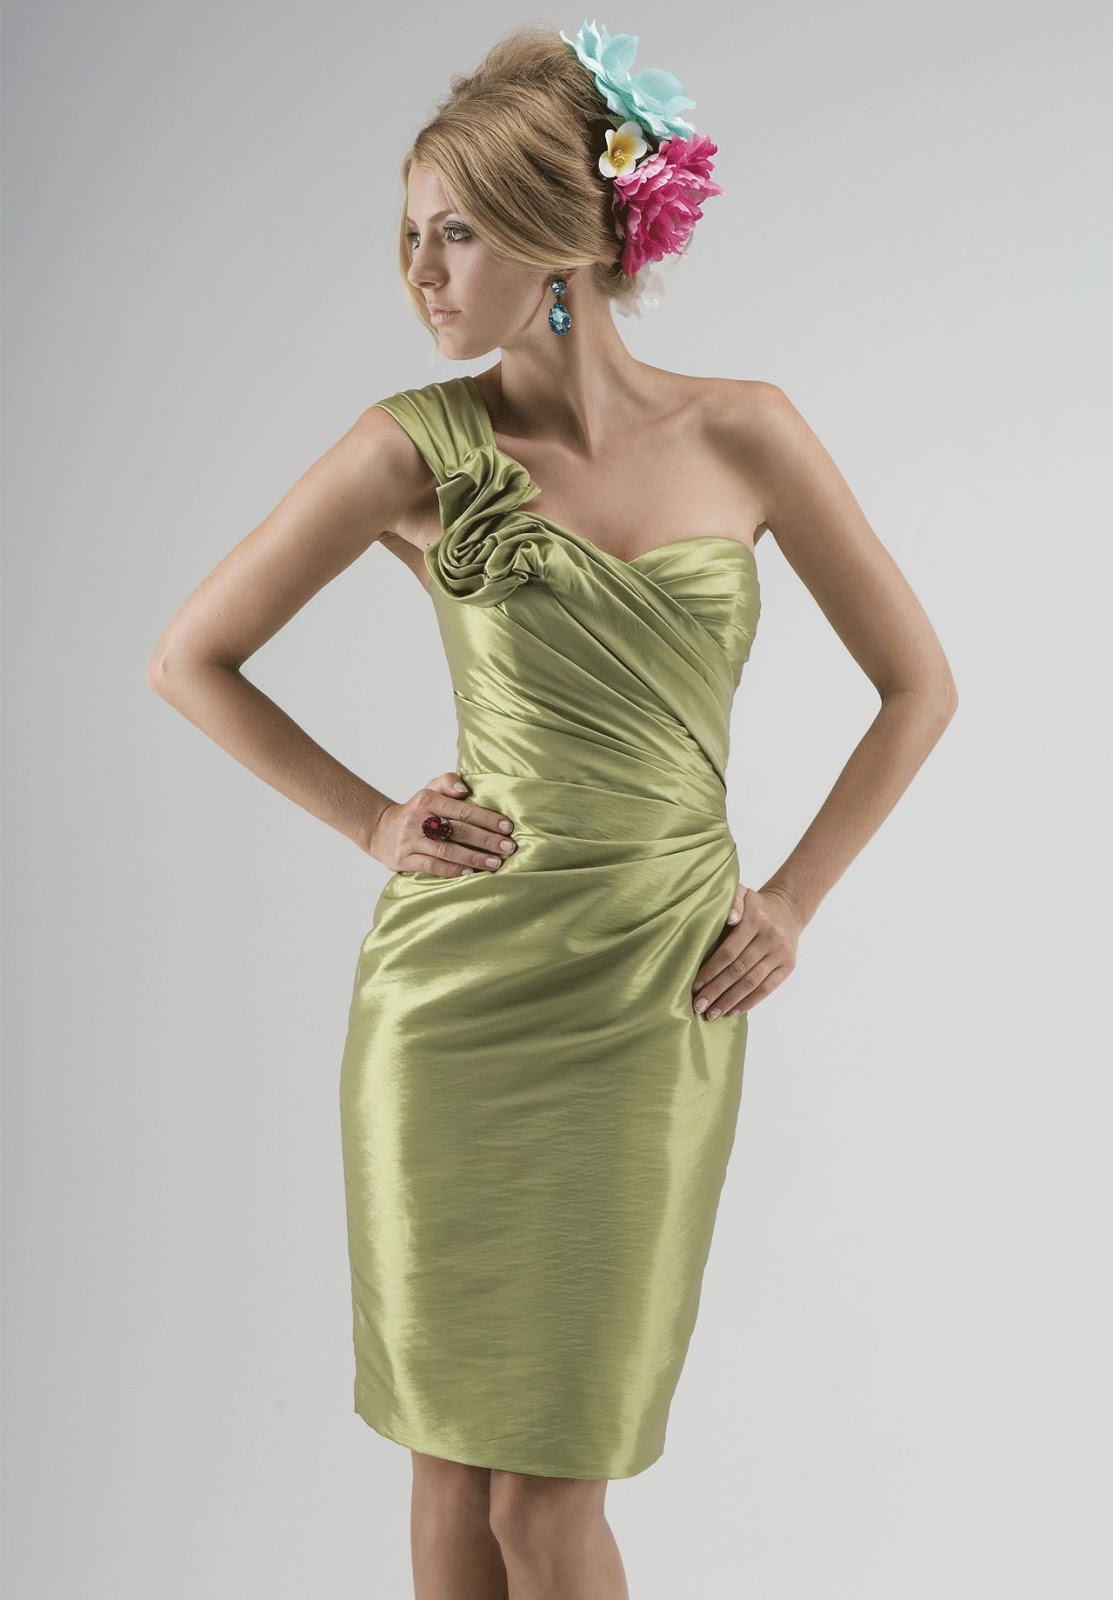 WhiteAzalea Bridesmaid Dresses: One Shoulder Bridesmaid ...